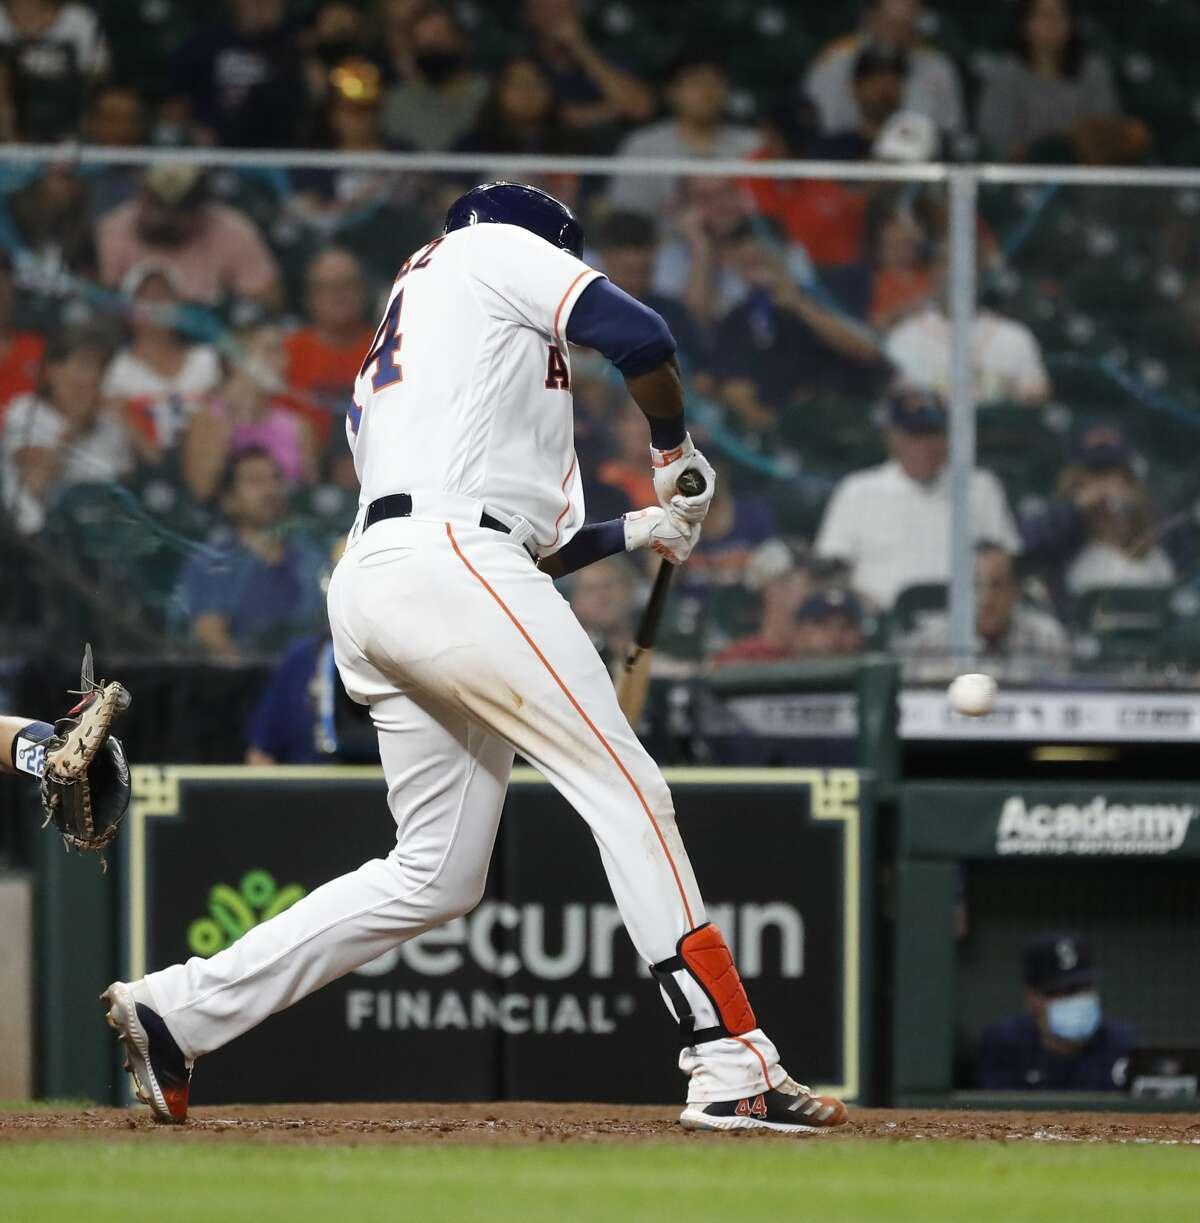 Houston Astros designated hitter Yordan Alvarez (44) singles during the seventh inning of an MLB baseball game at Minute Maid Park, Monday, April 26, 2021, in Houston.